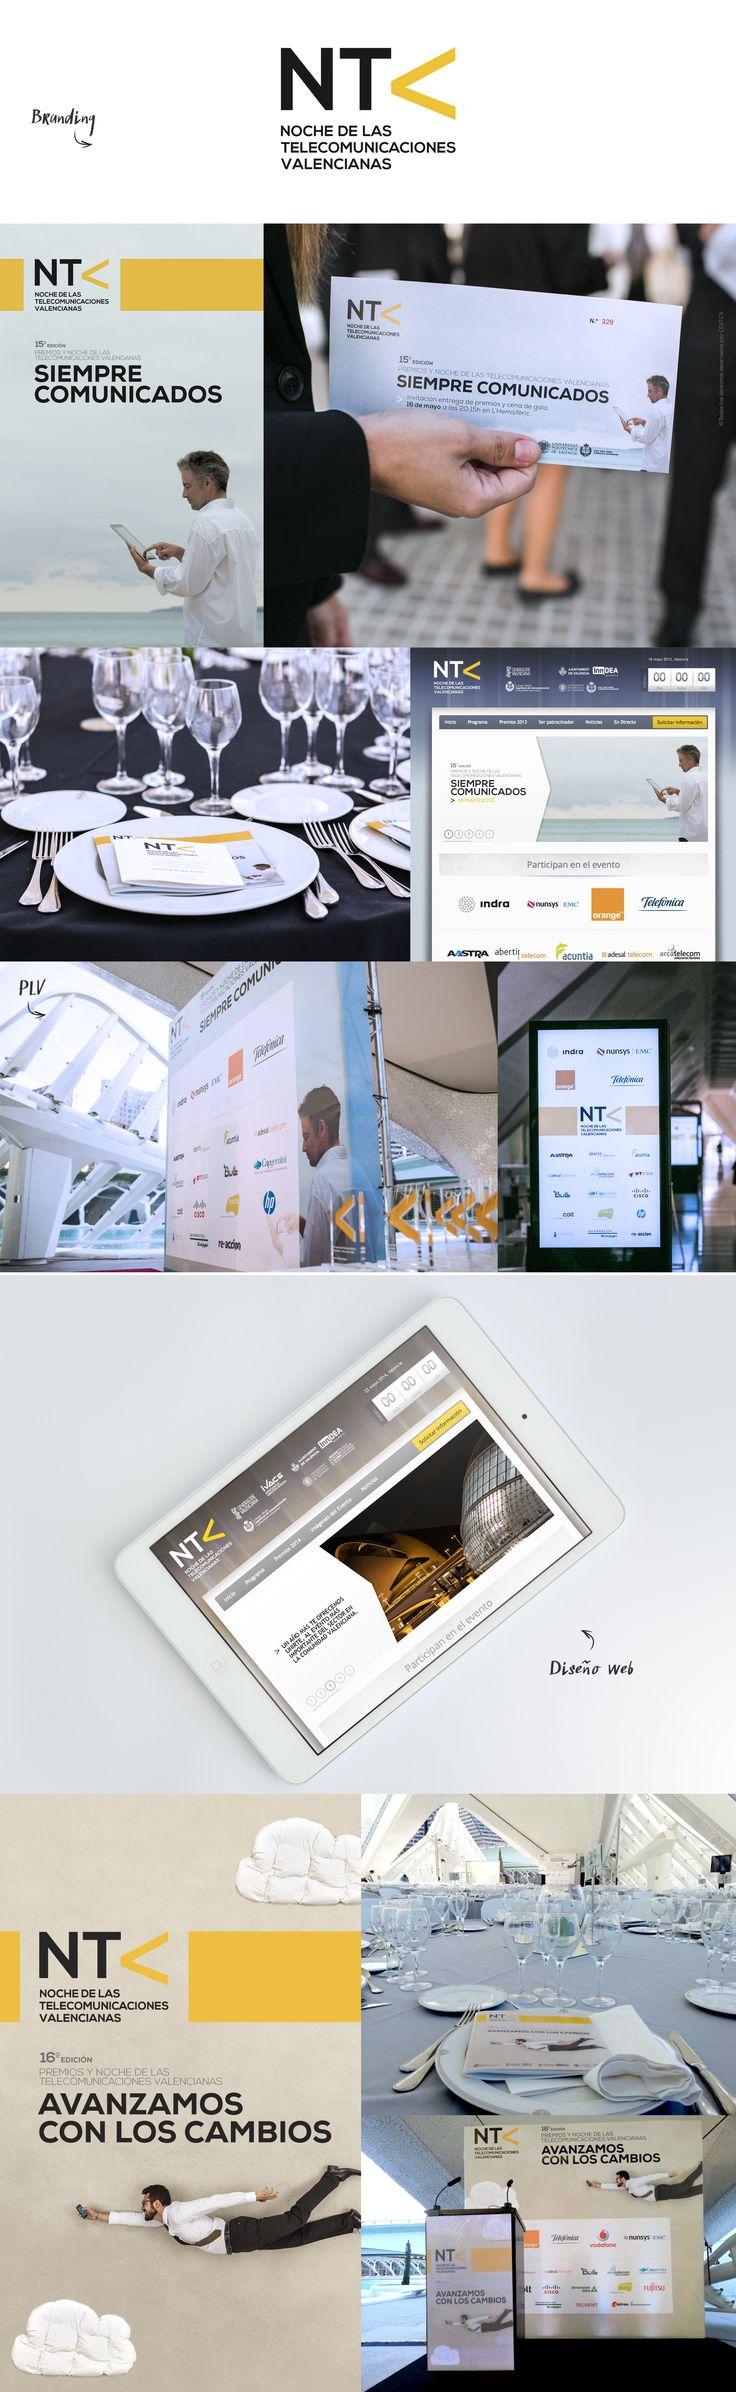 #ntv #brand #web #design #naming #plv #graphic #project #branding